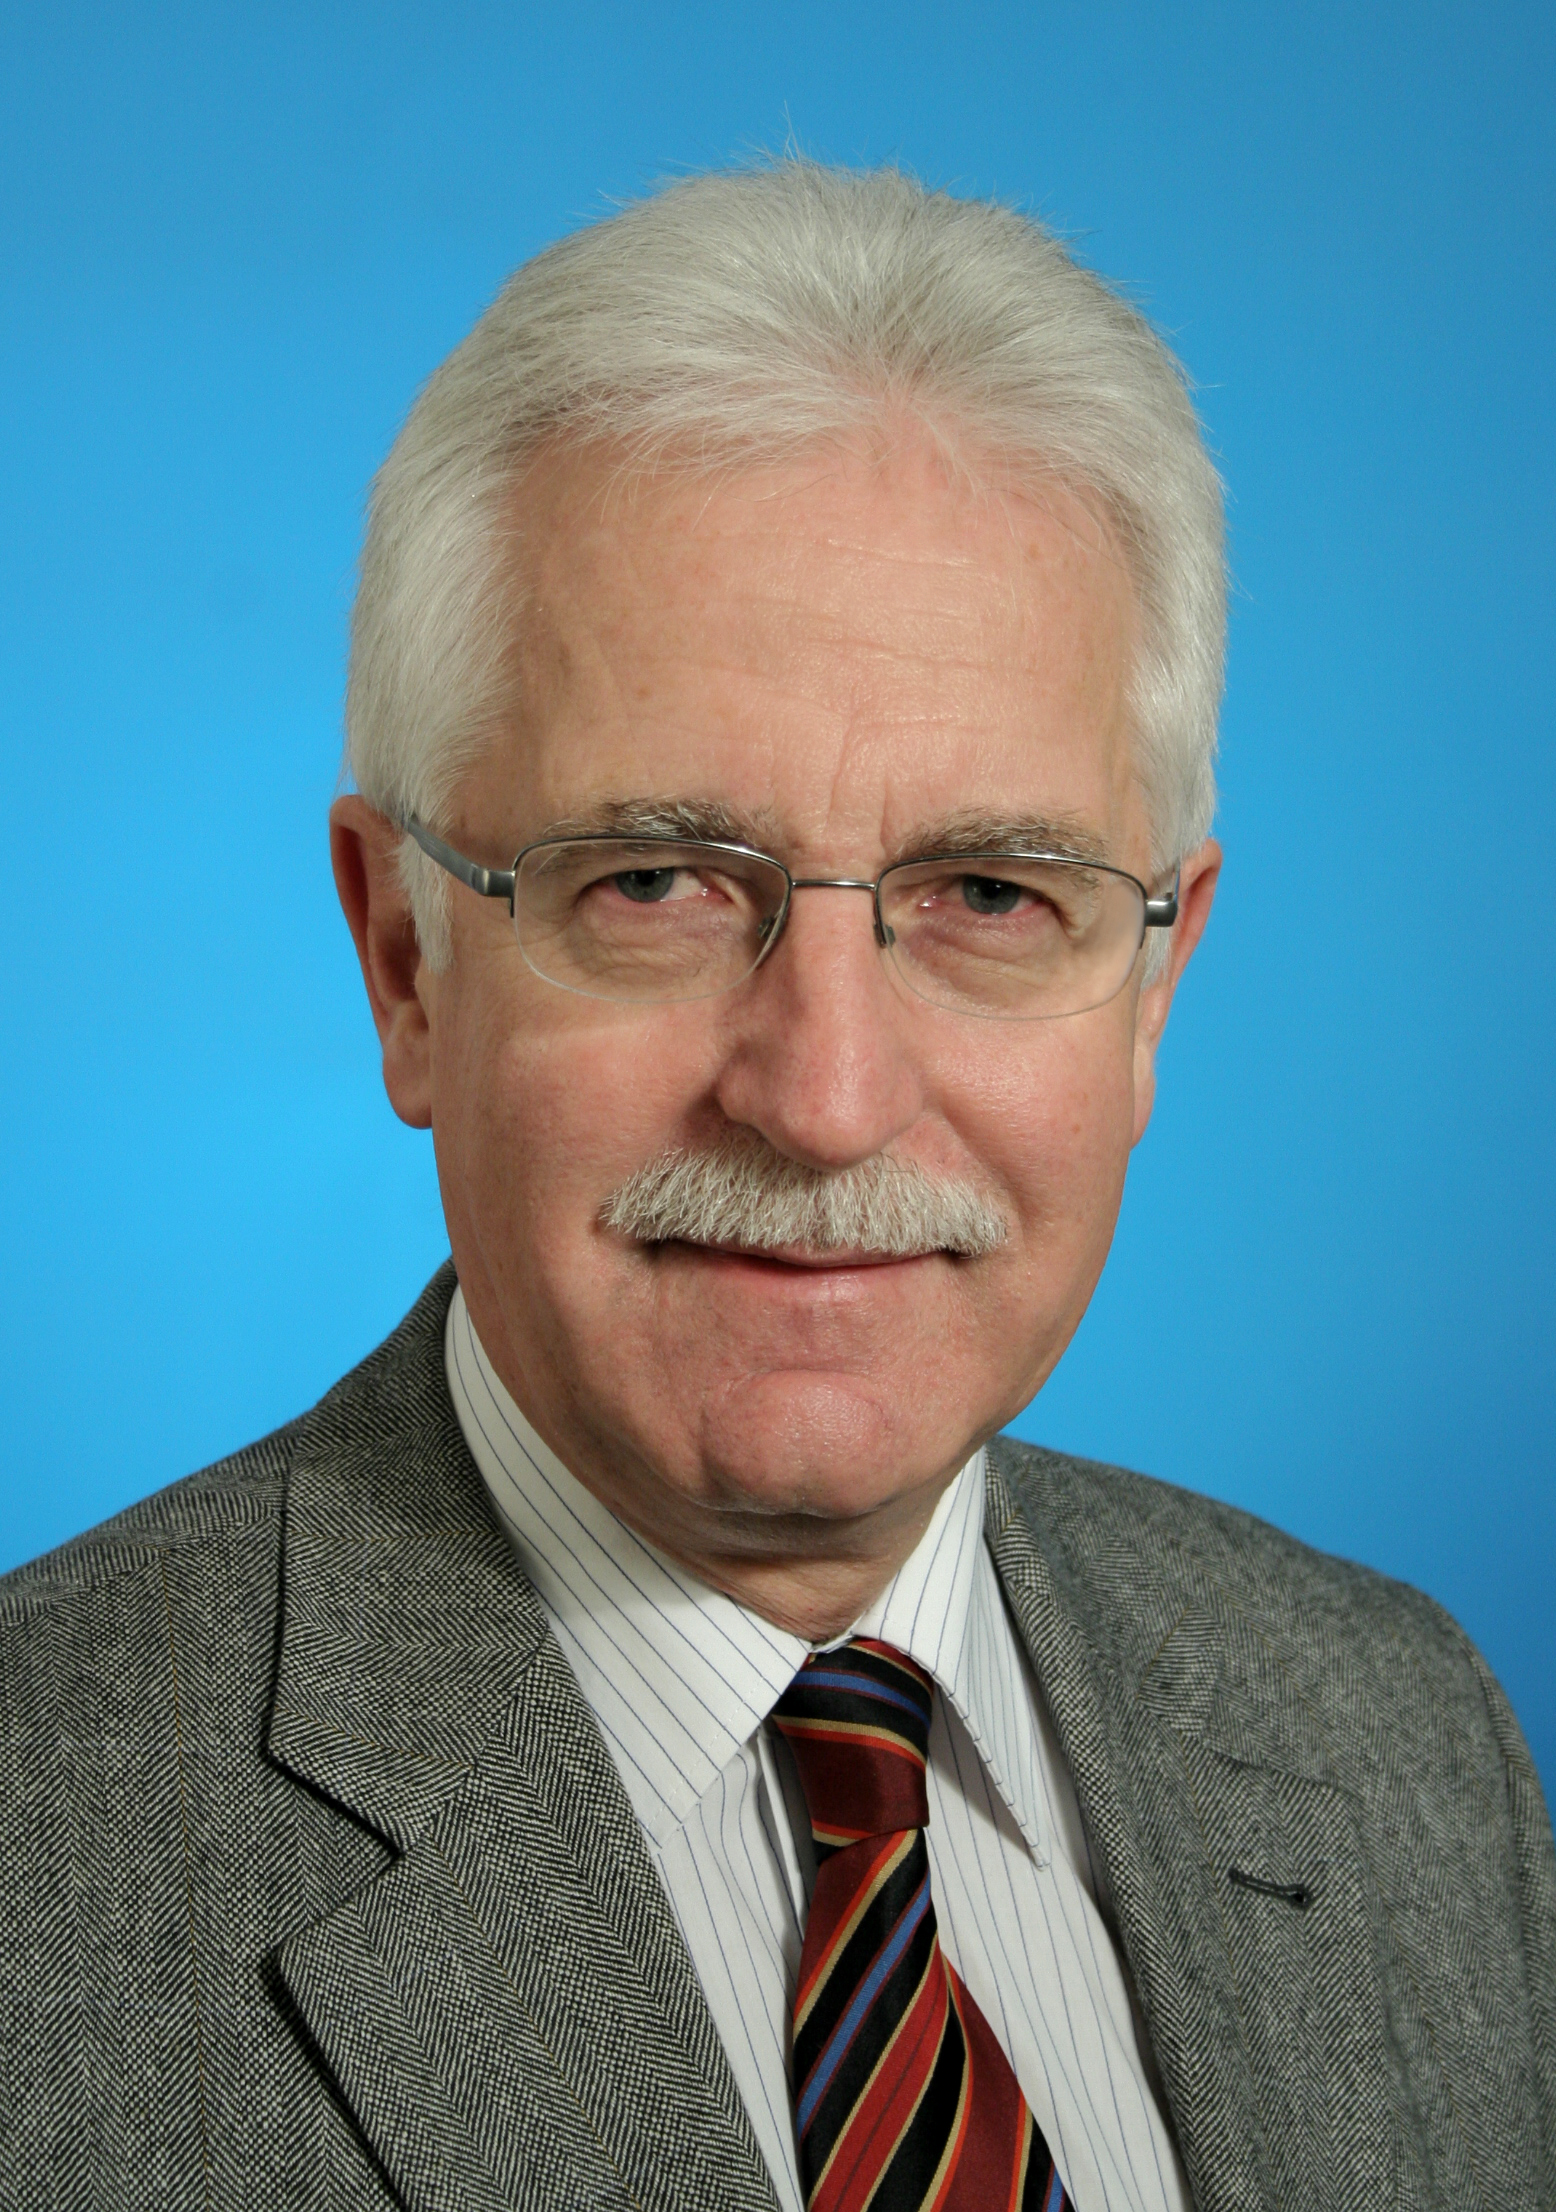 Andreas Donatsch